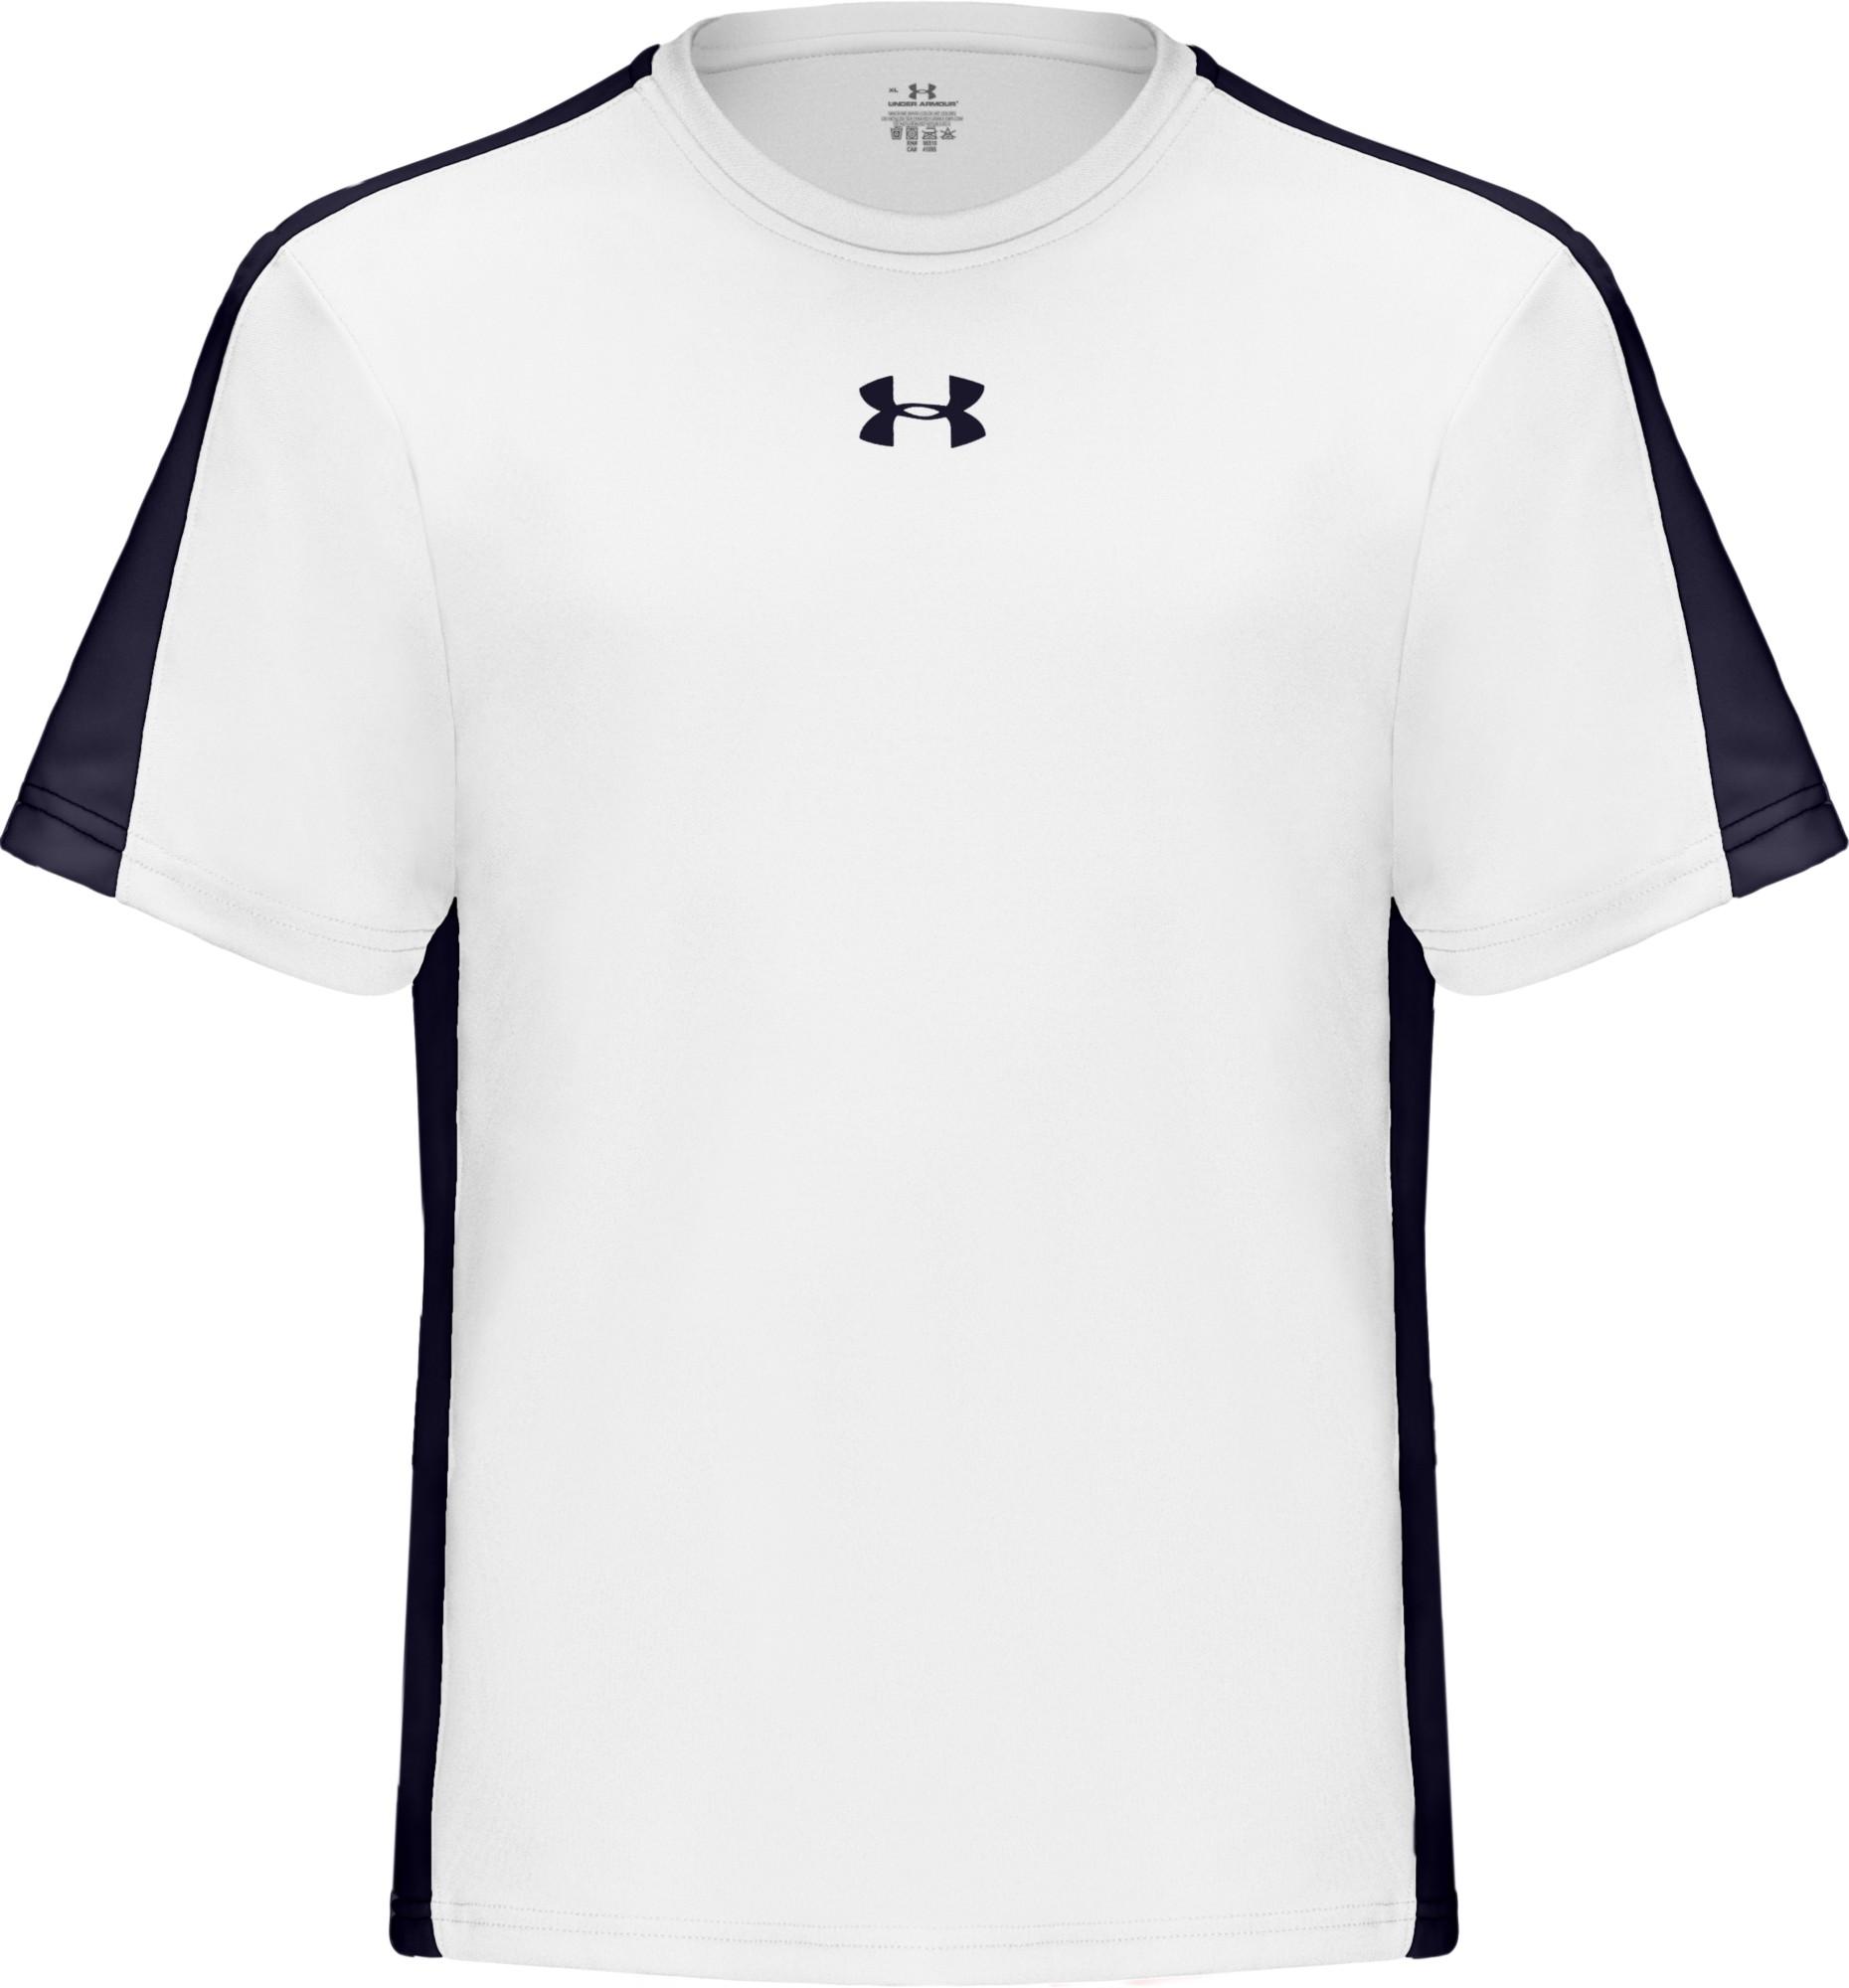 Under Armour Team Zone T Shirt